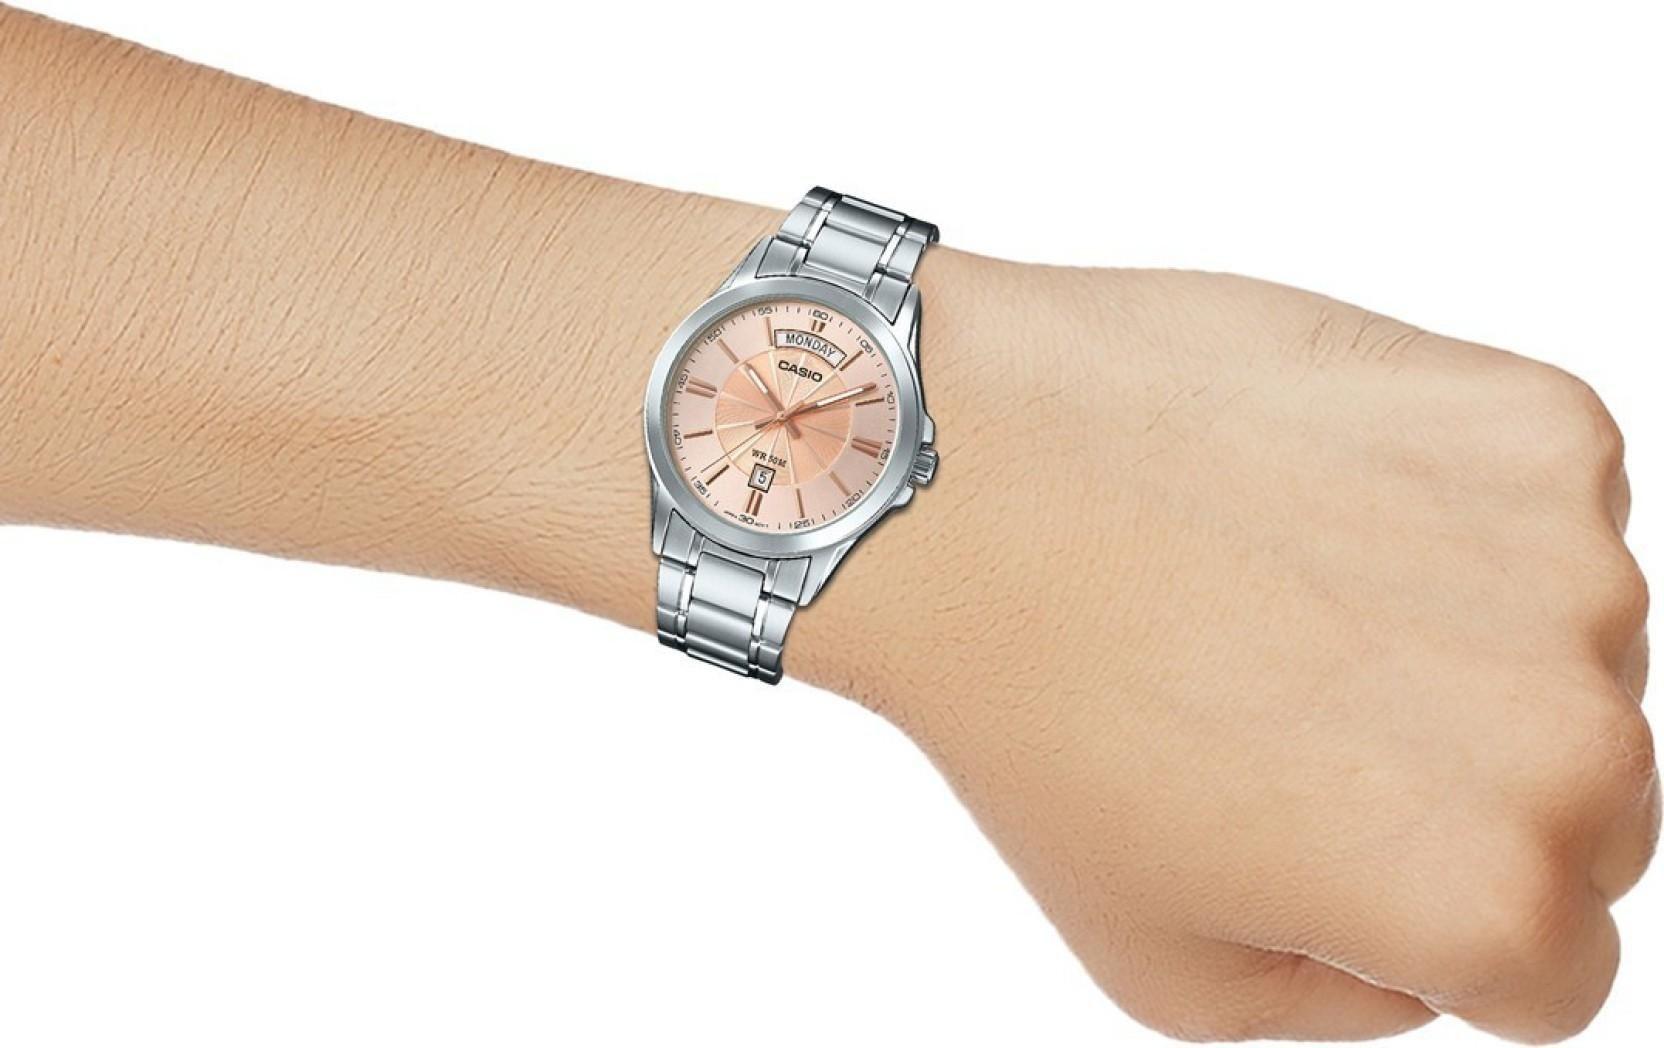 Casio A1132 Enticer Men's Watch - For Men